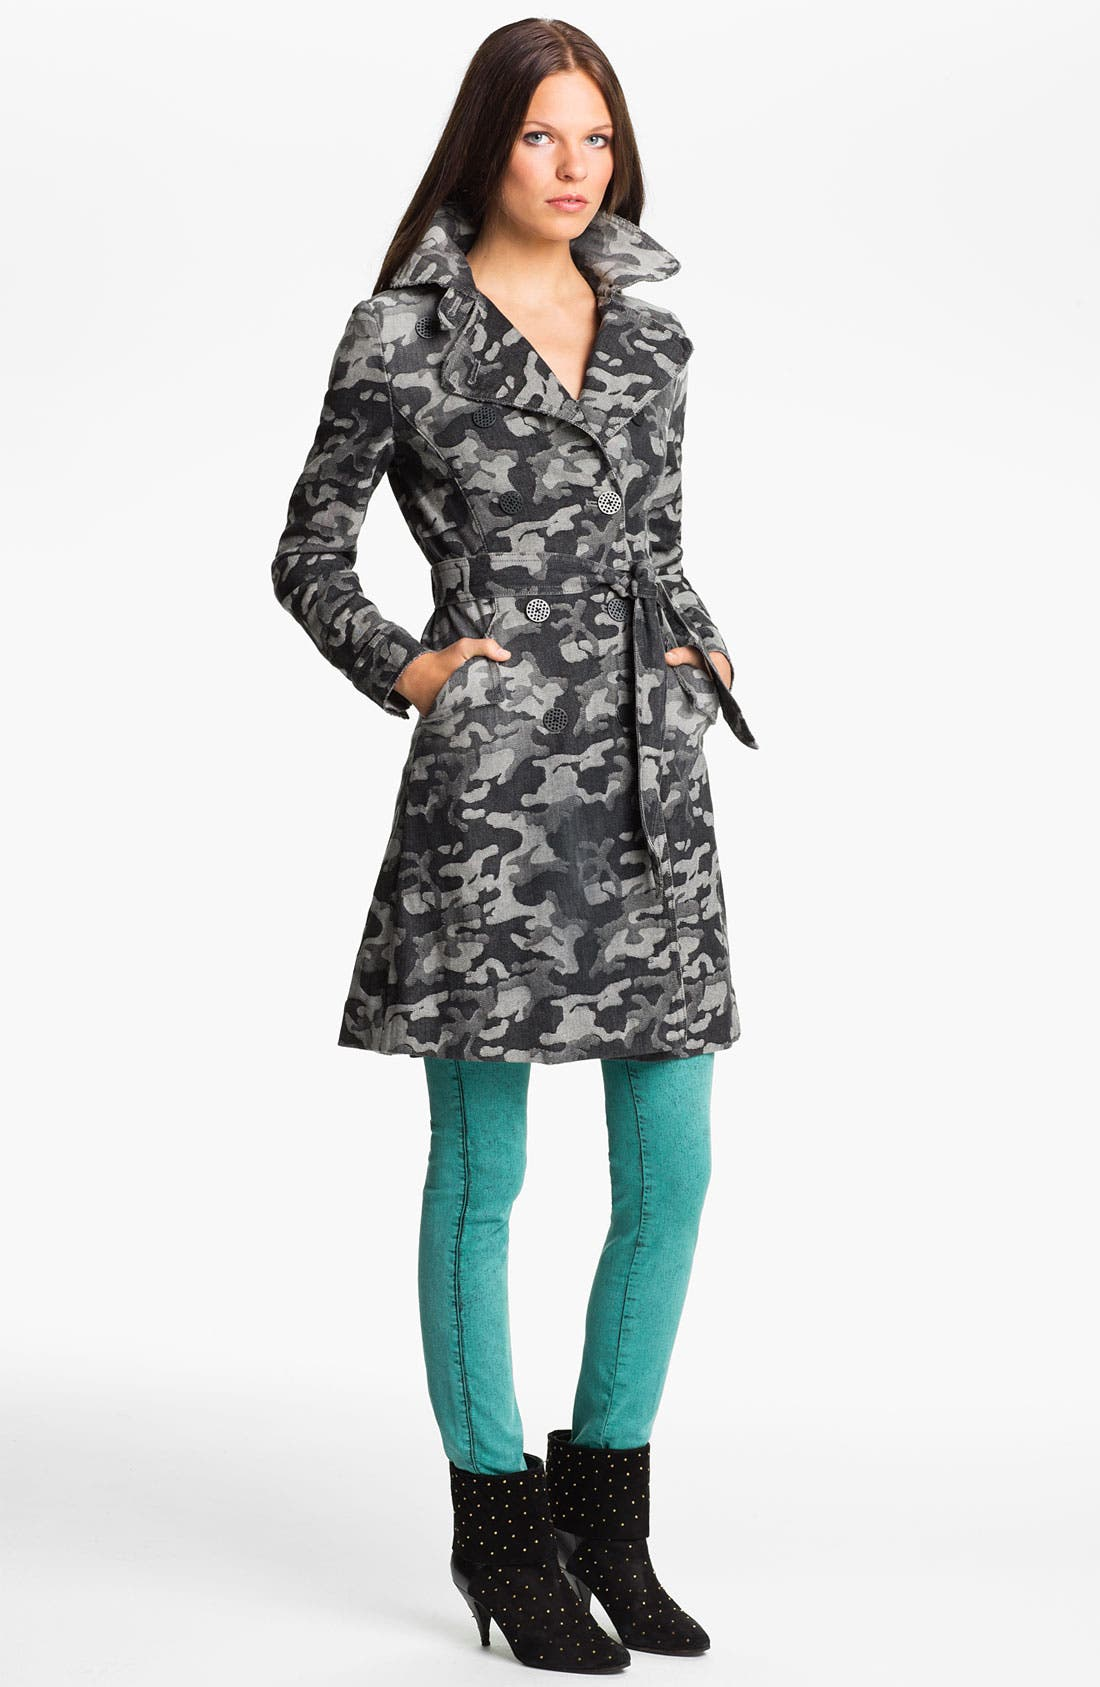 Main Image - Kelly Wearstler 'Chameleon' Camo Print Trench Coat